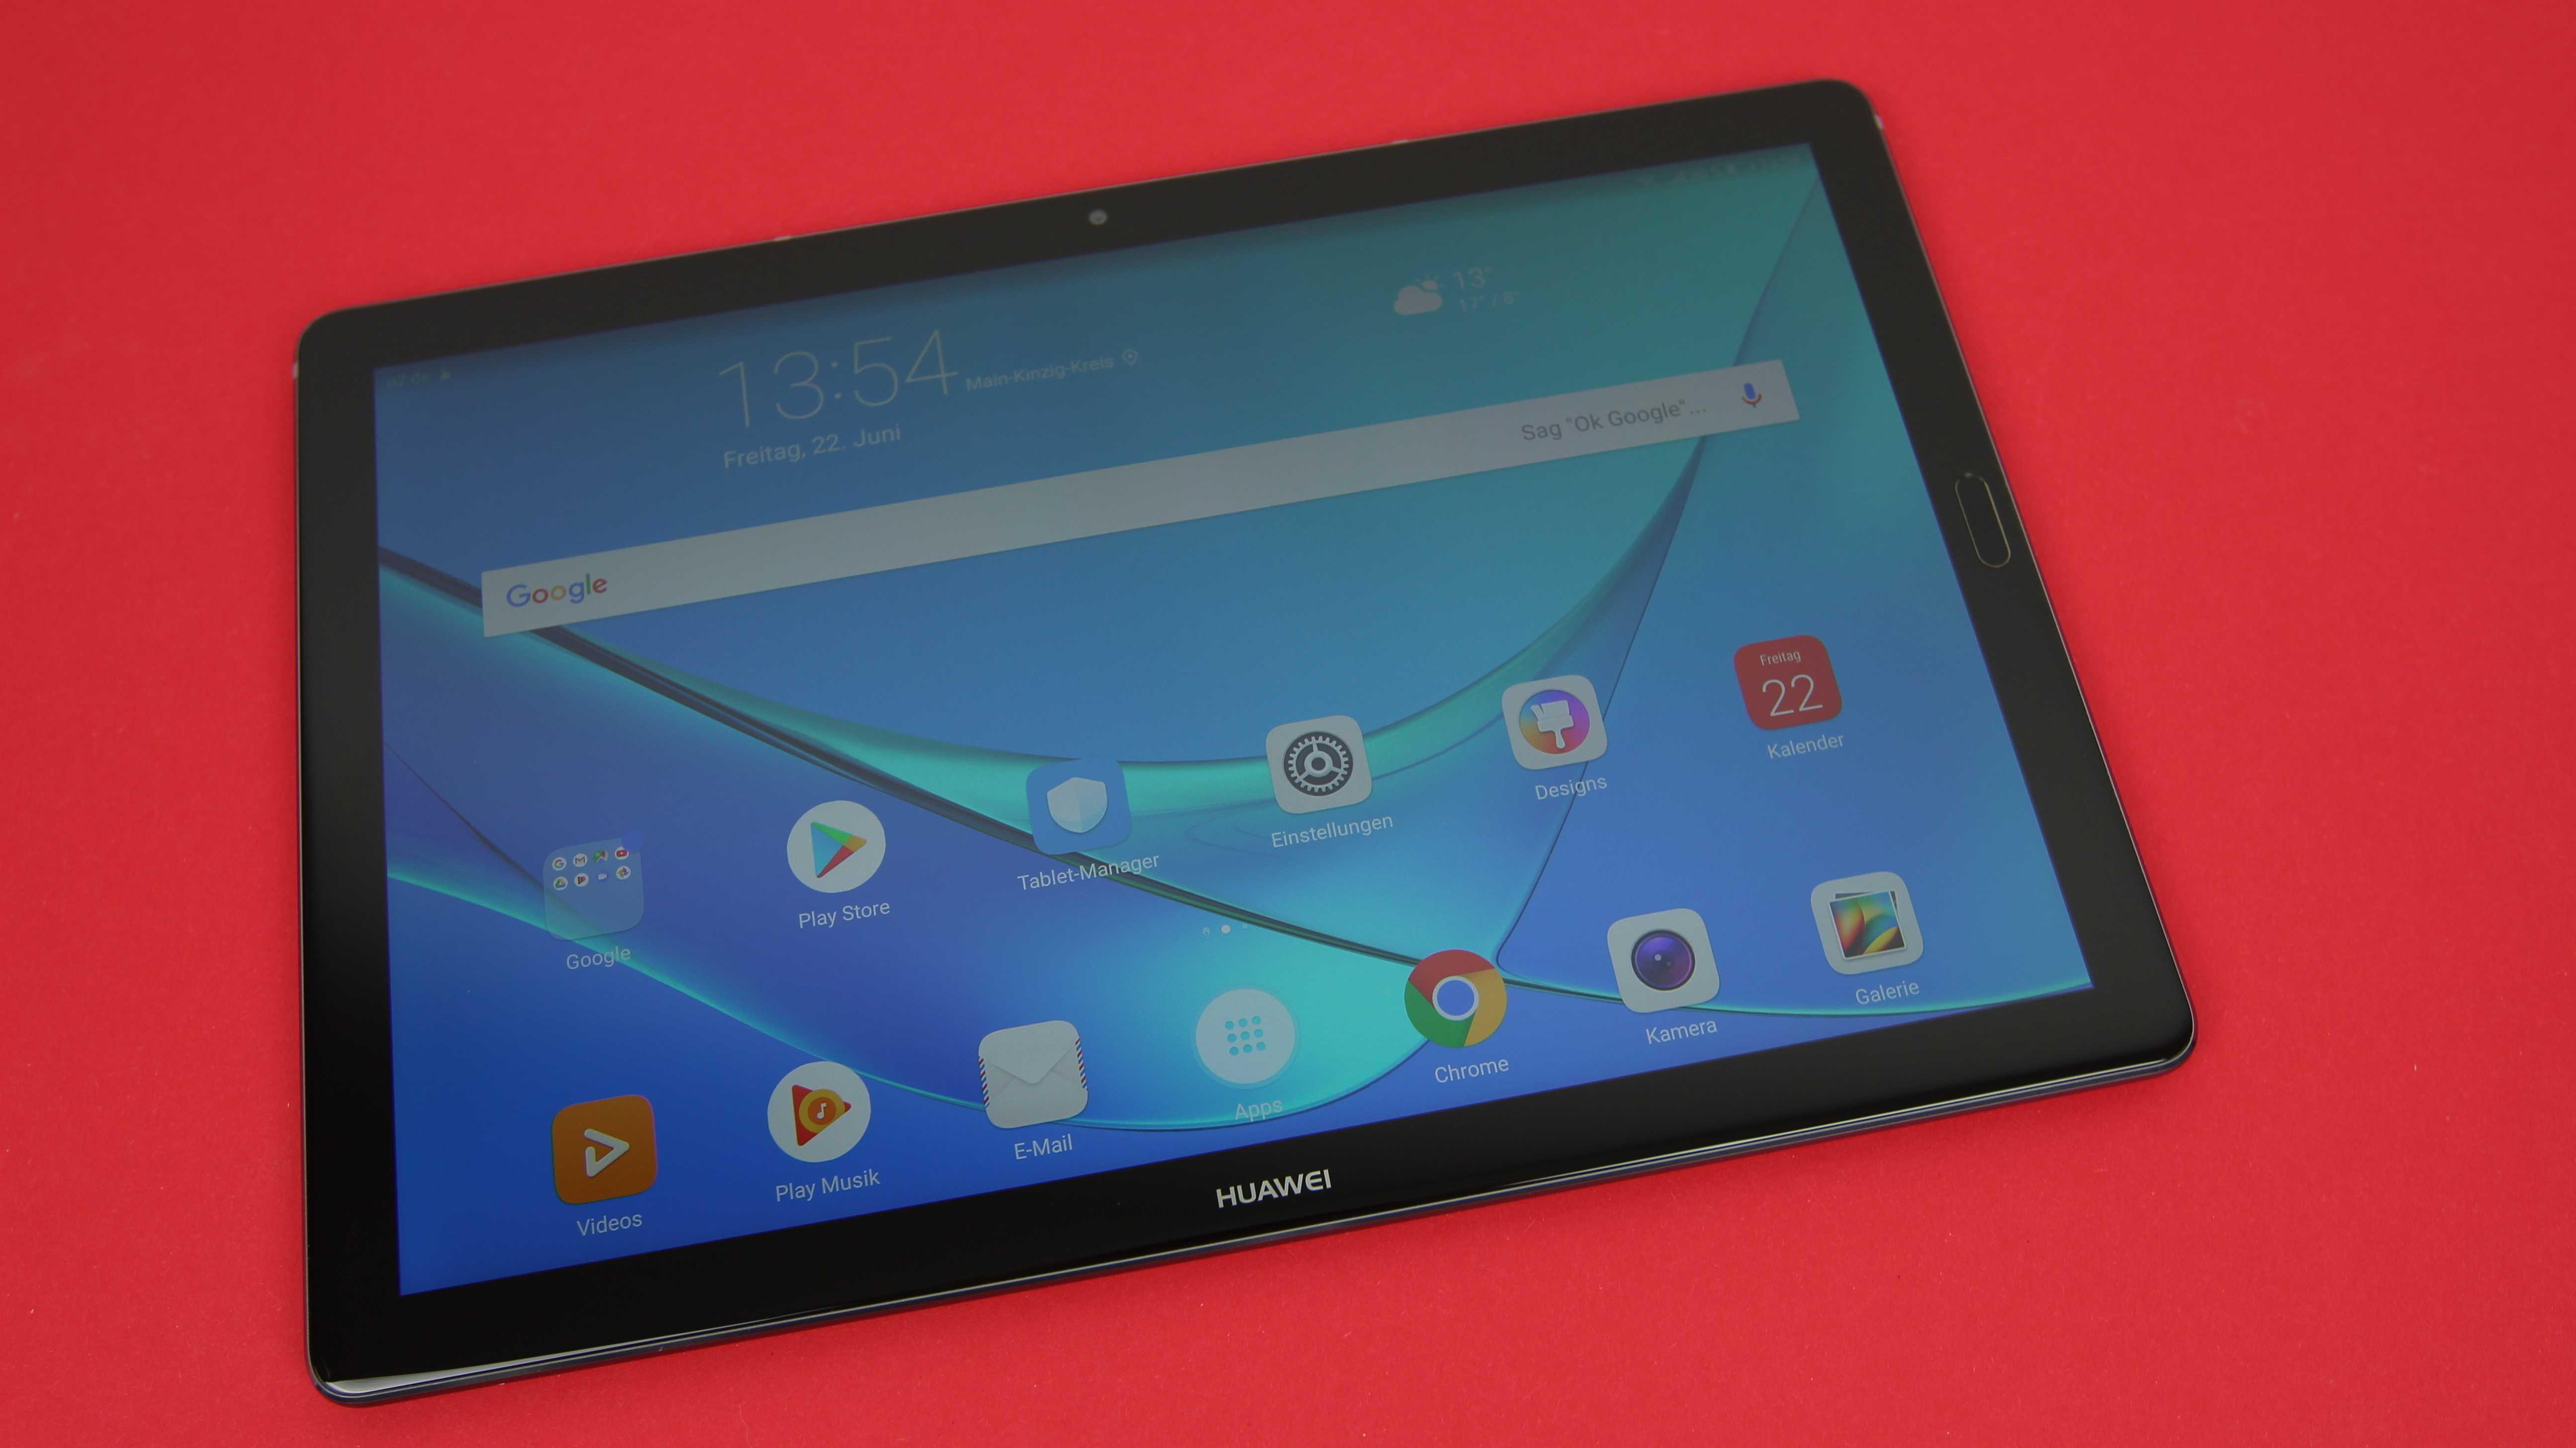 Huawei Mediapad M5 10 LTE: Leistungsstarkes Android-Tablet